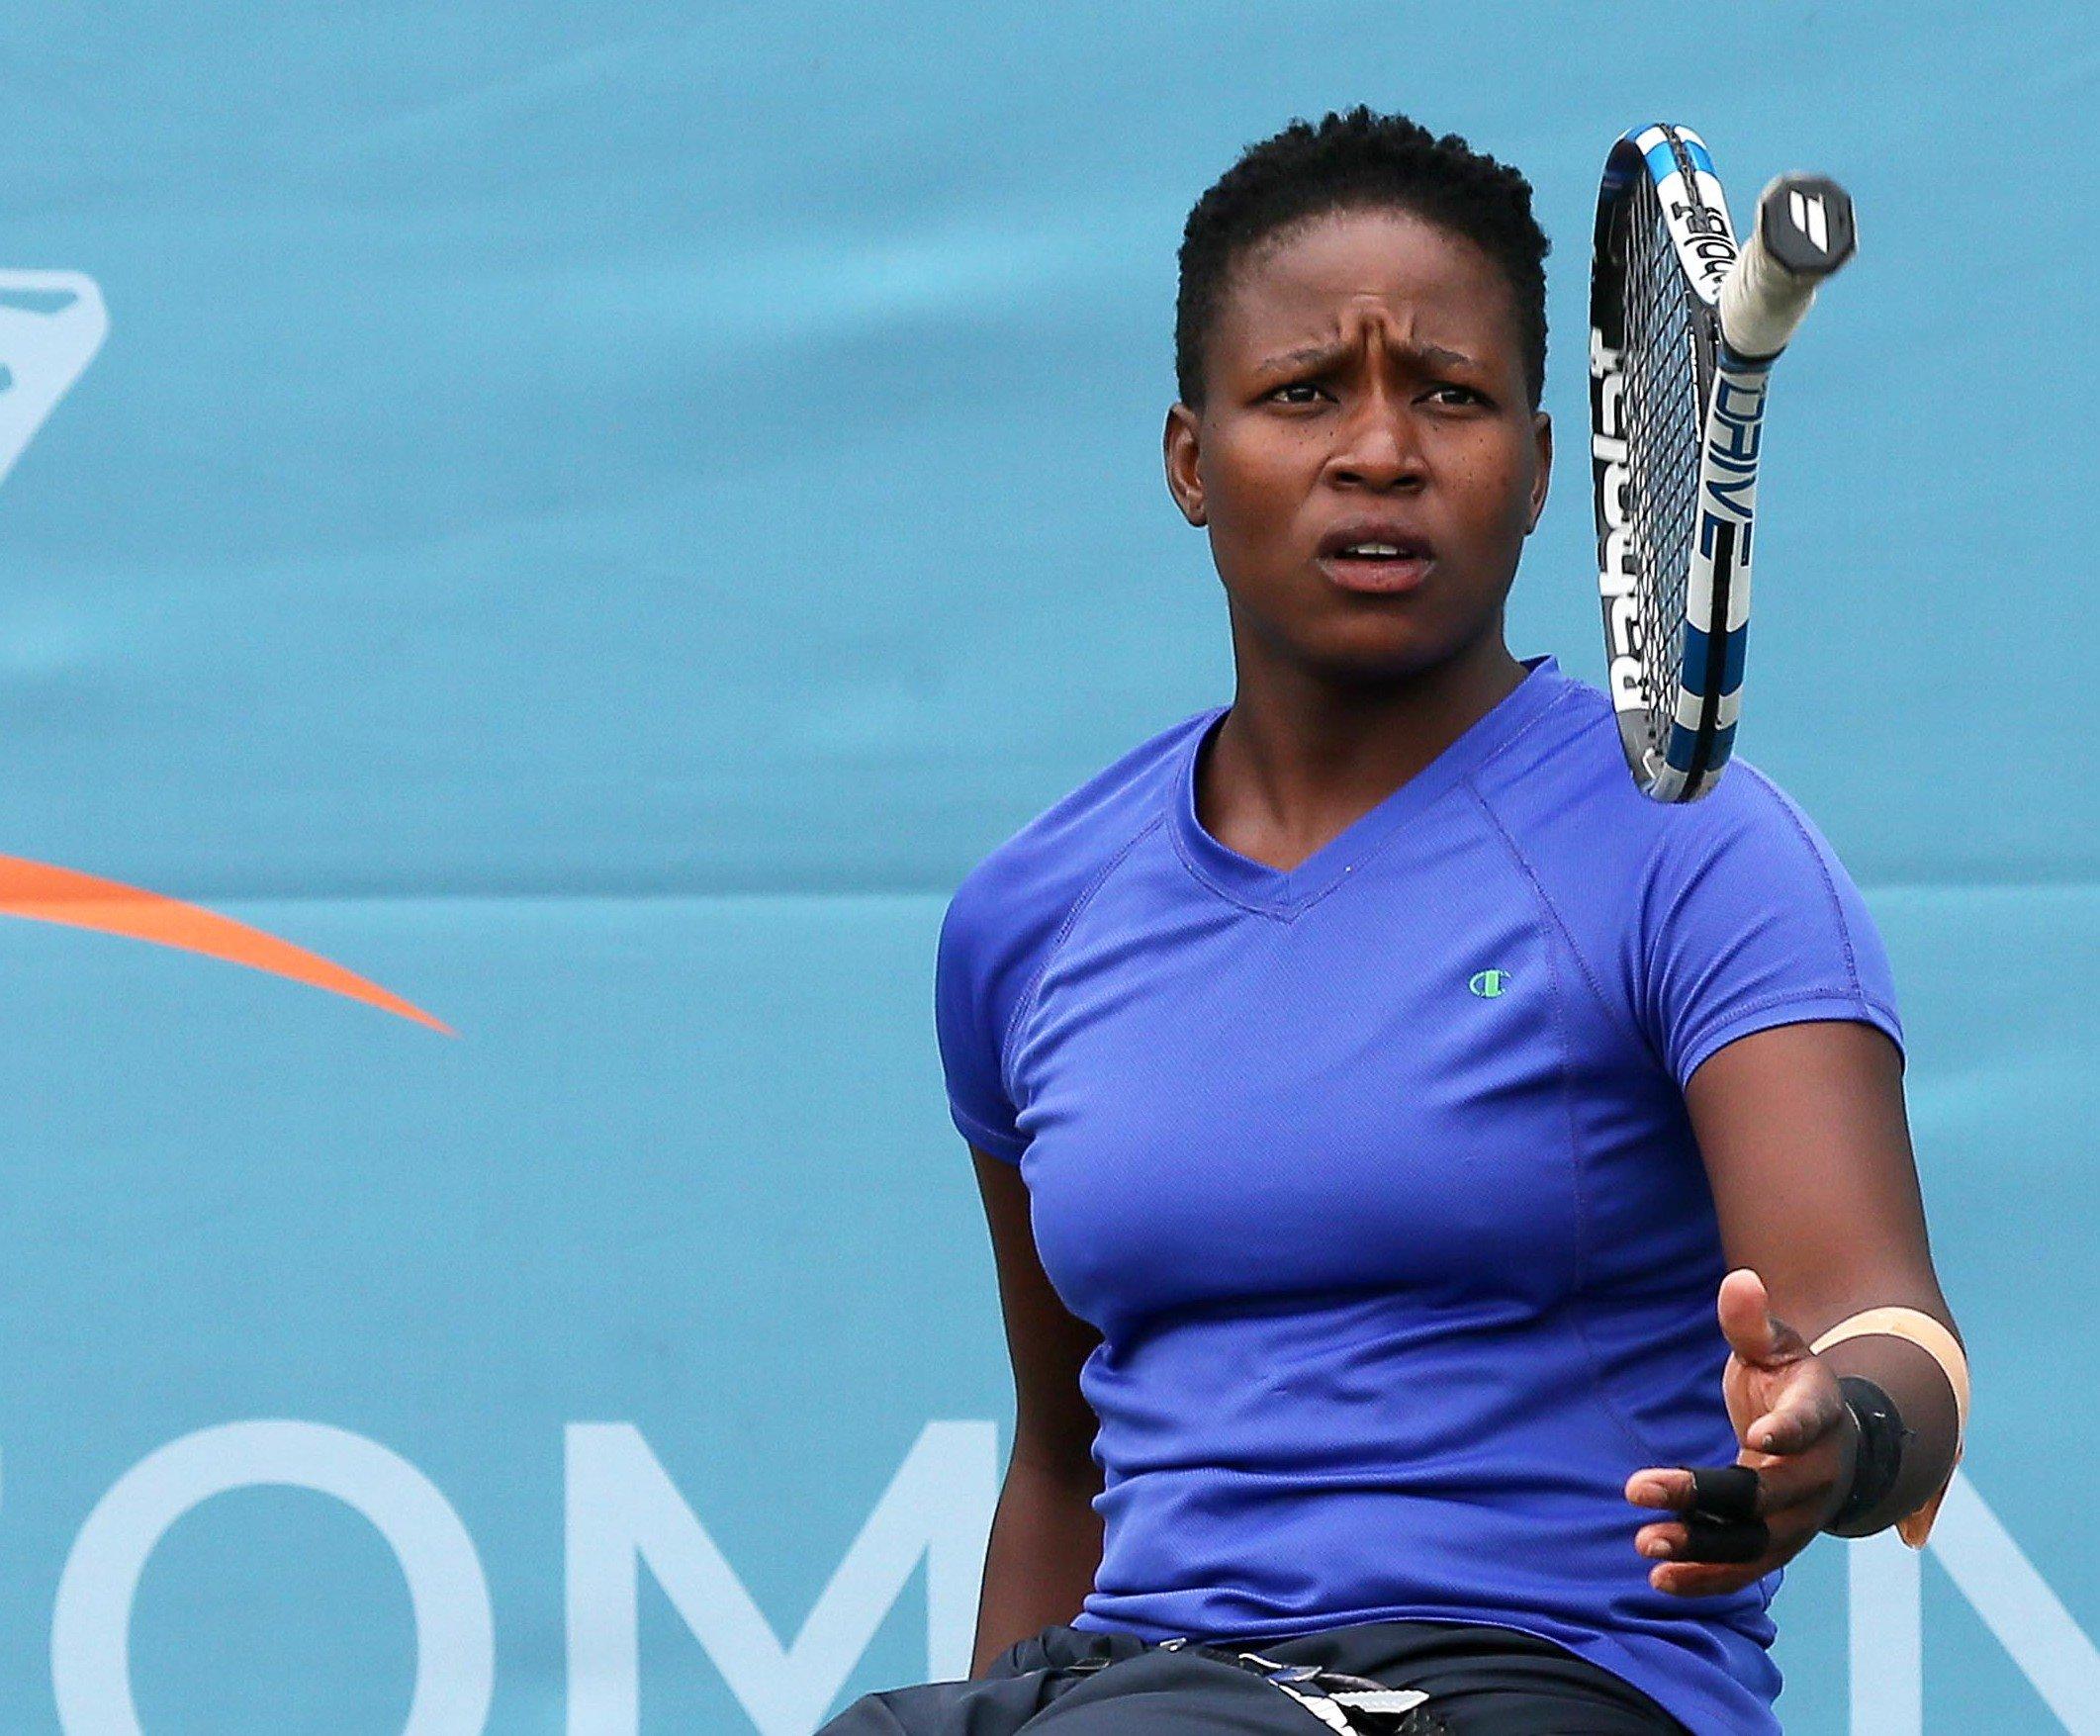 Montjane wins second US Open title